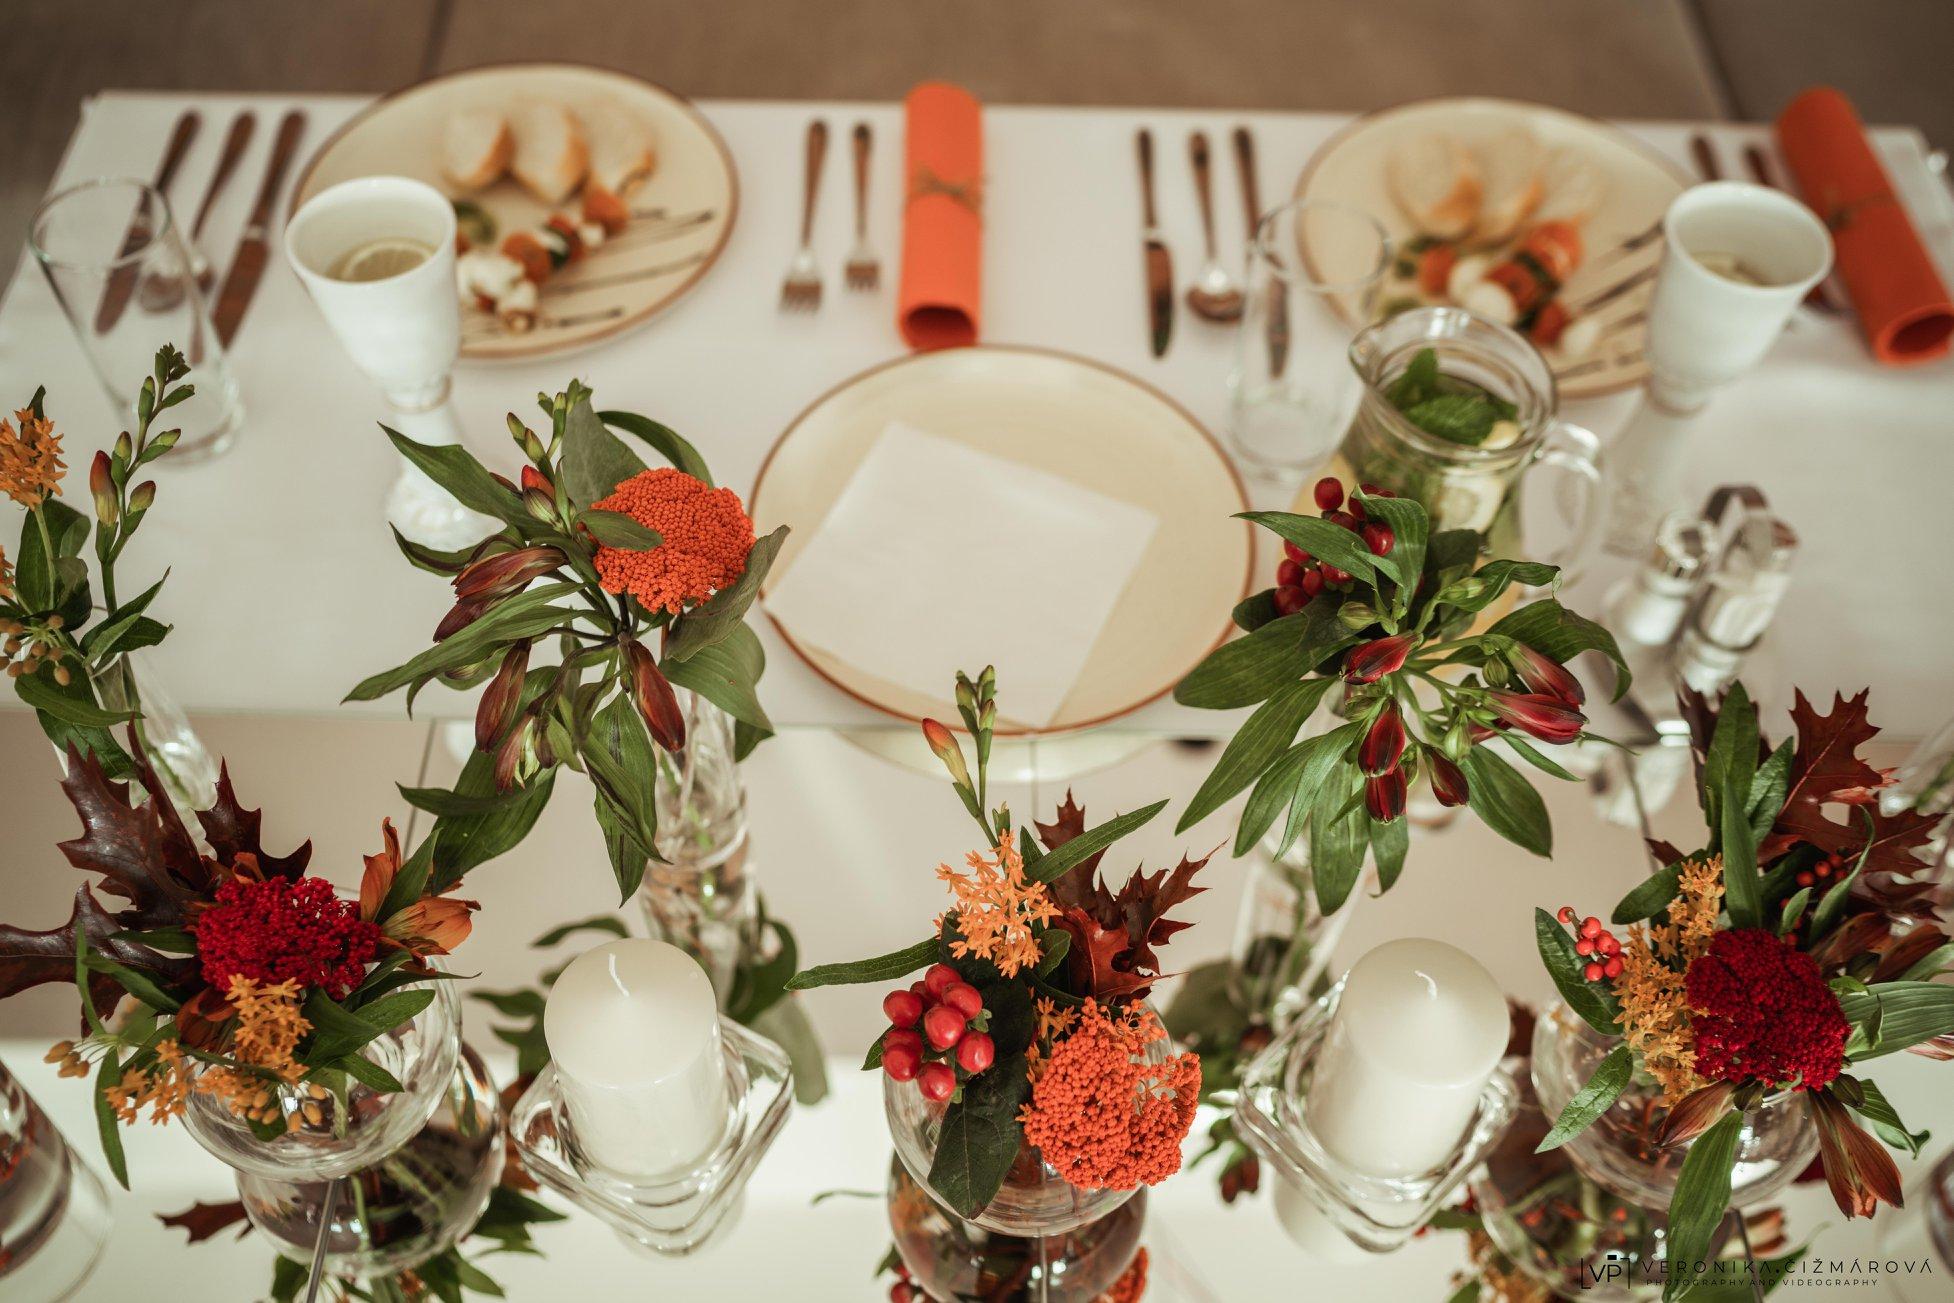 jesenna-zimna-svadba-vyzdobajpg